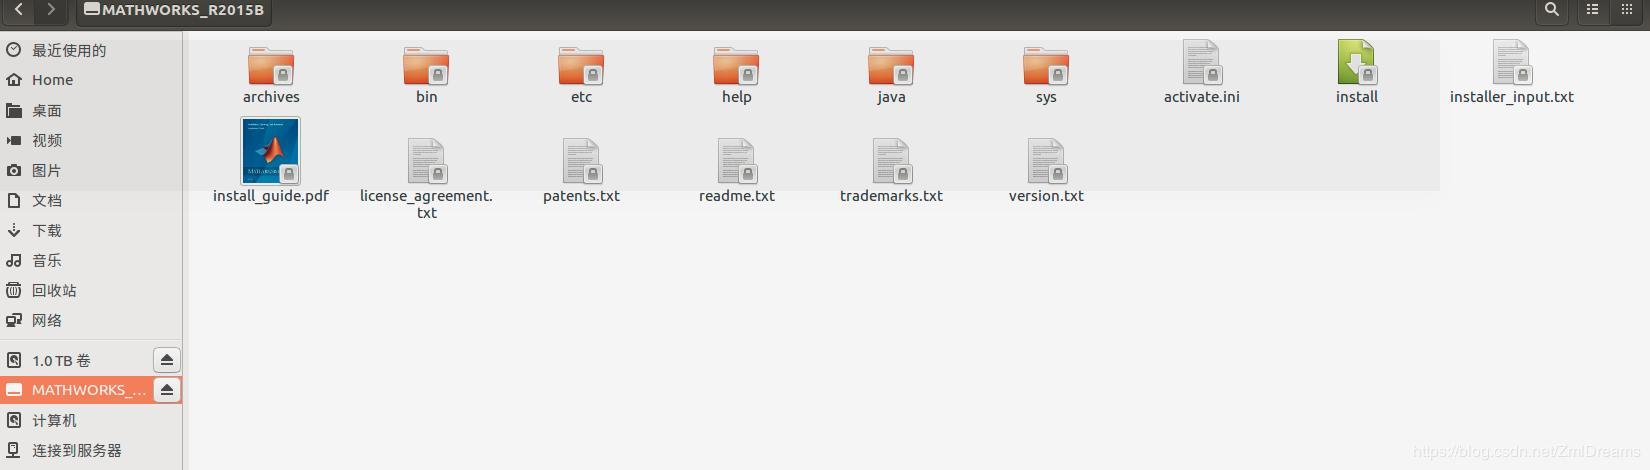 Install Matlab 2015b super detailed tutorial under Ubuntu16